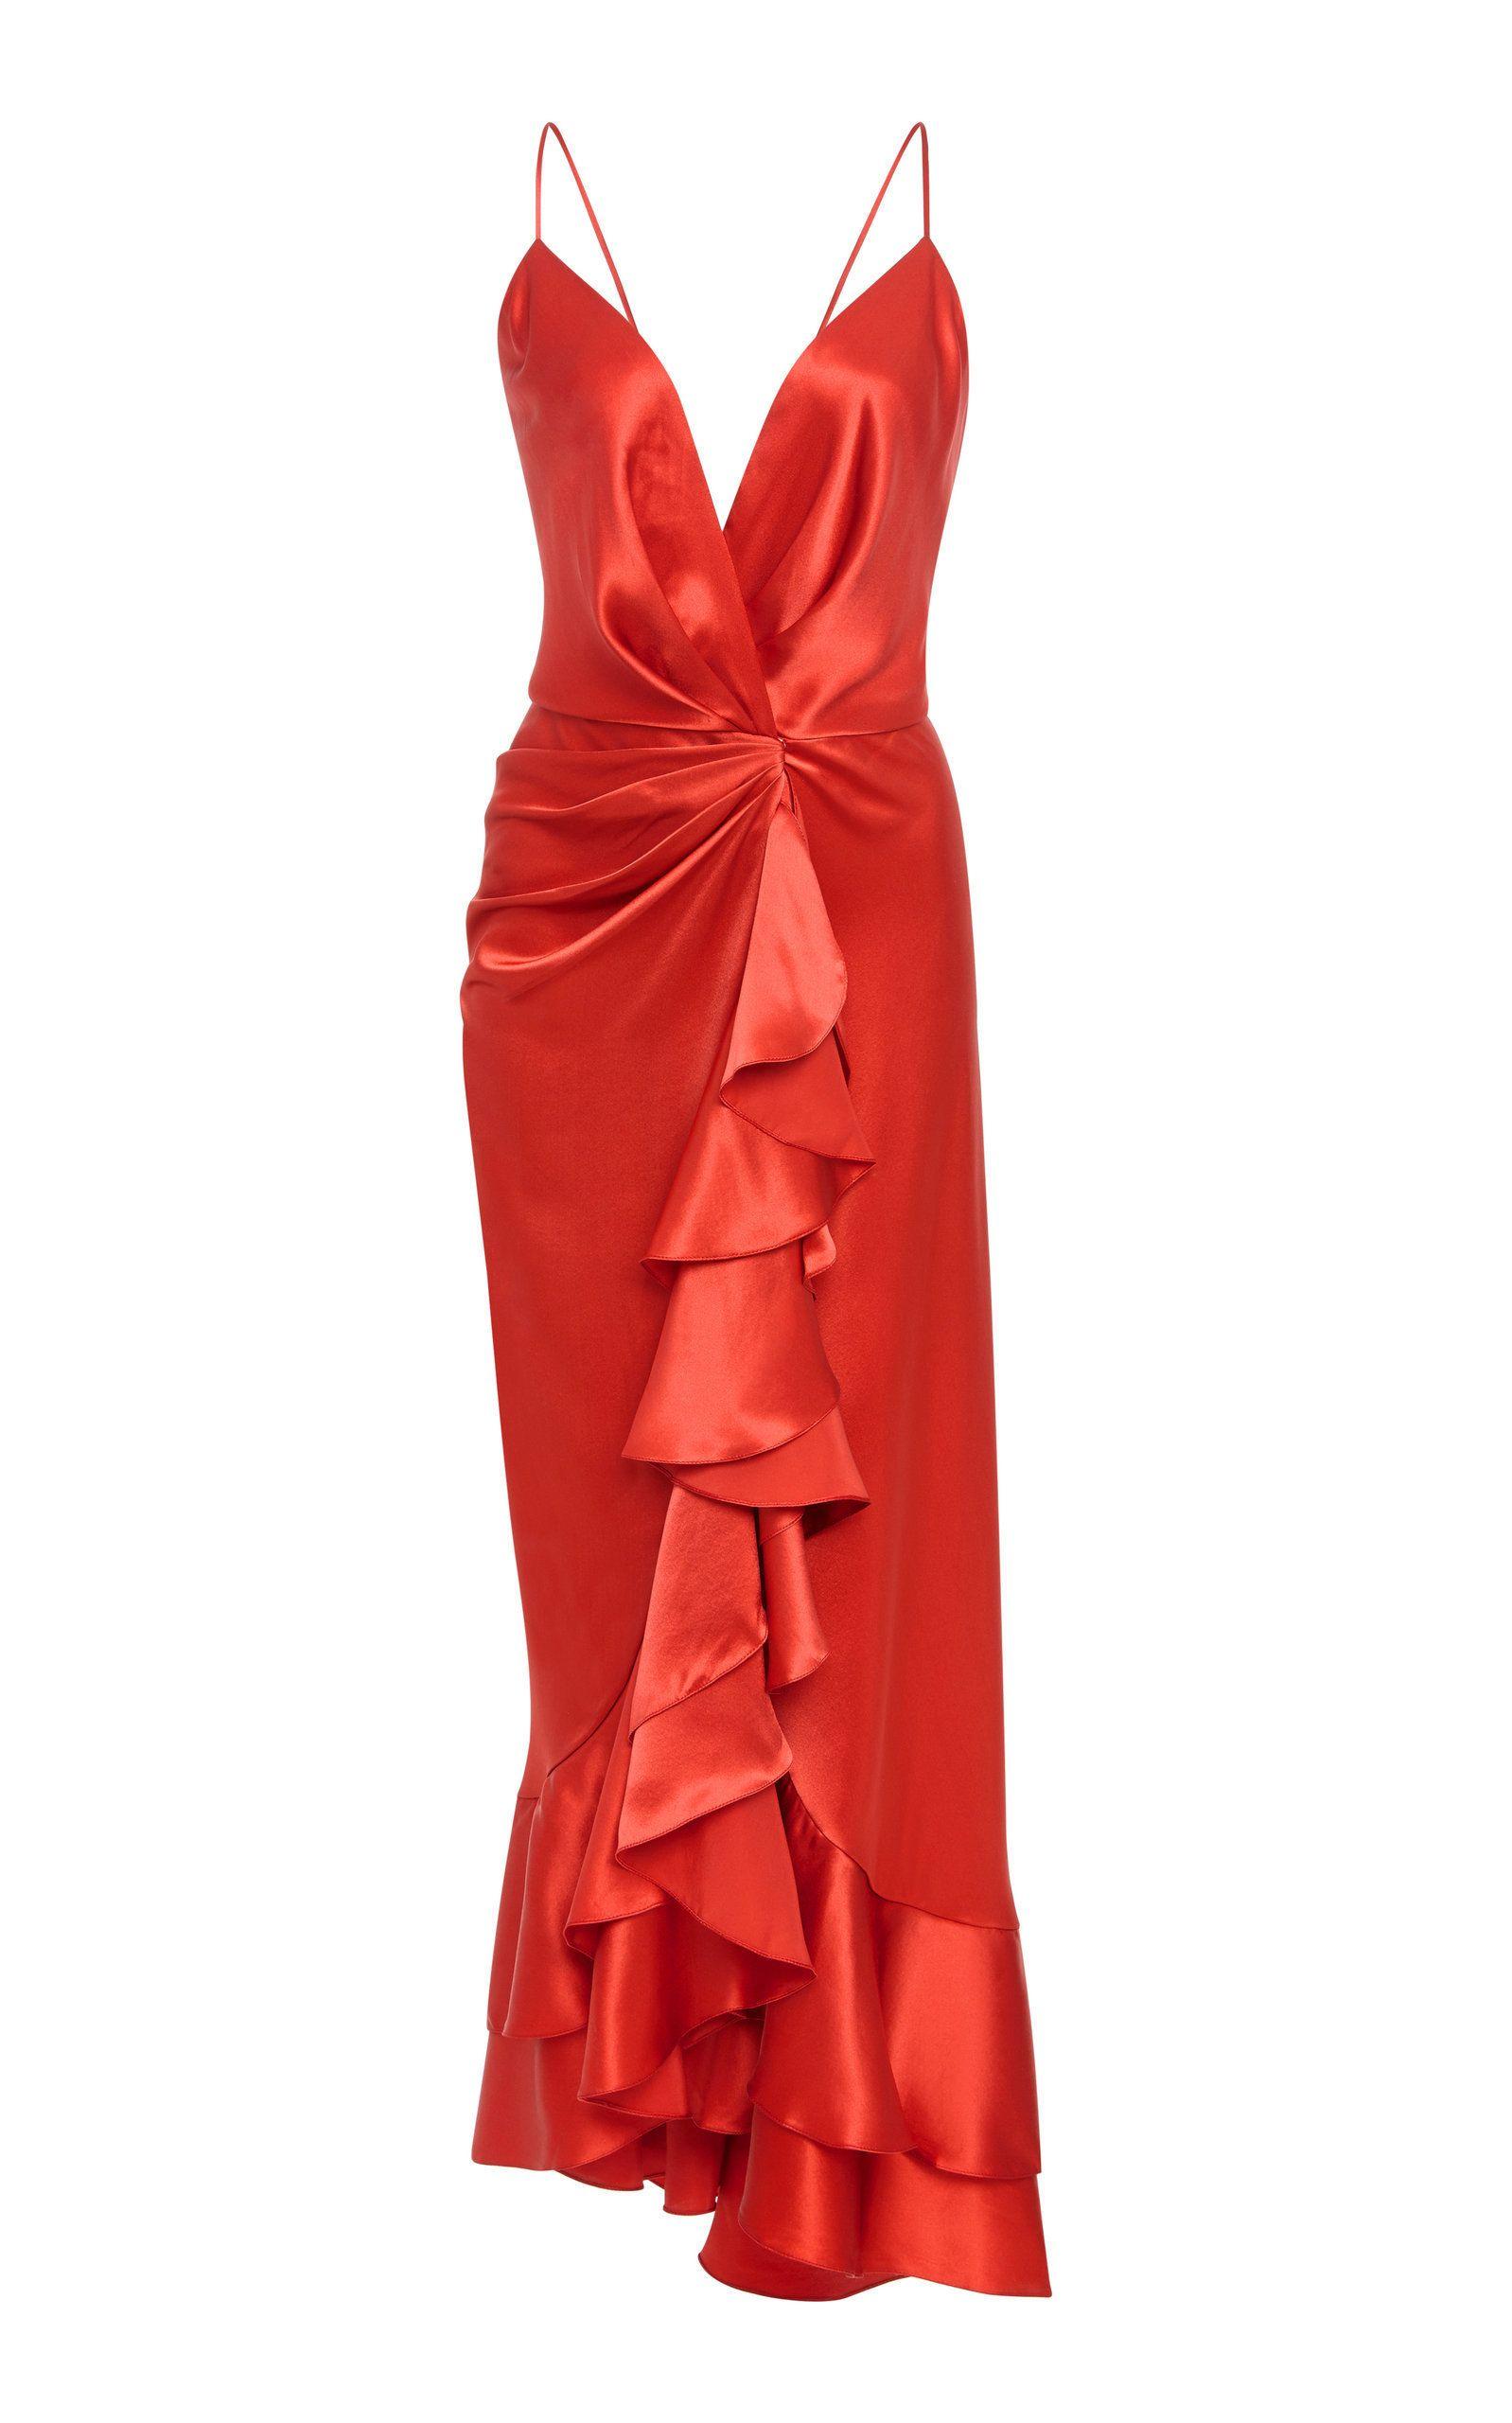 Dresses to wear to a destination wedding as a guest  Johanna Ortiz Perfumero Draped SilkCharmeuse Dress in